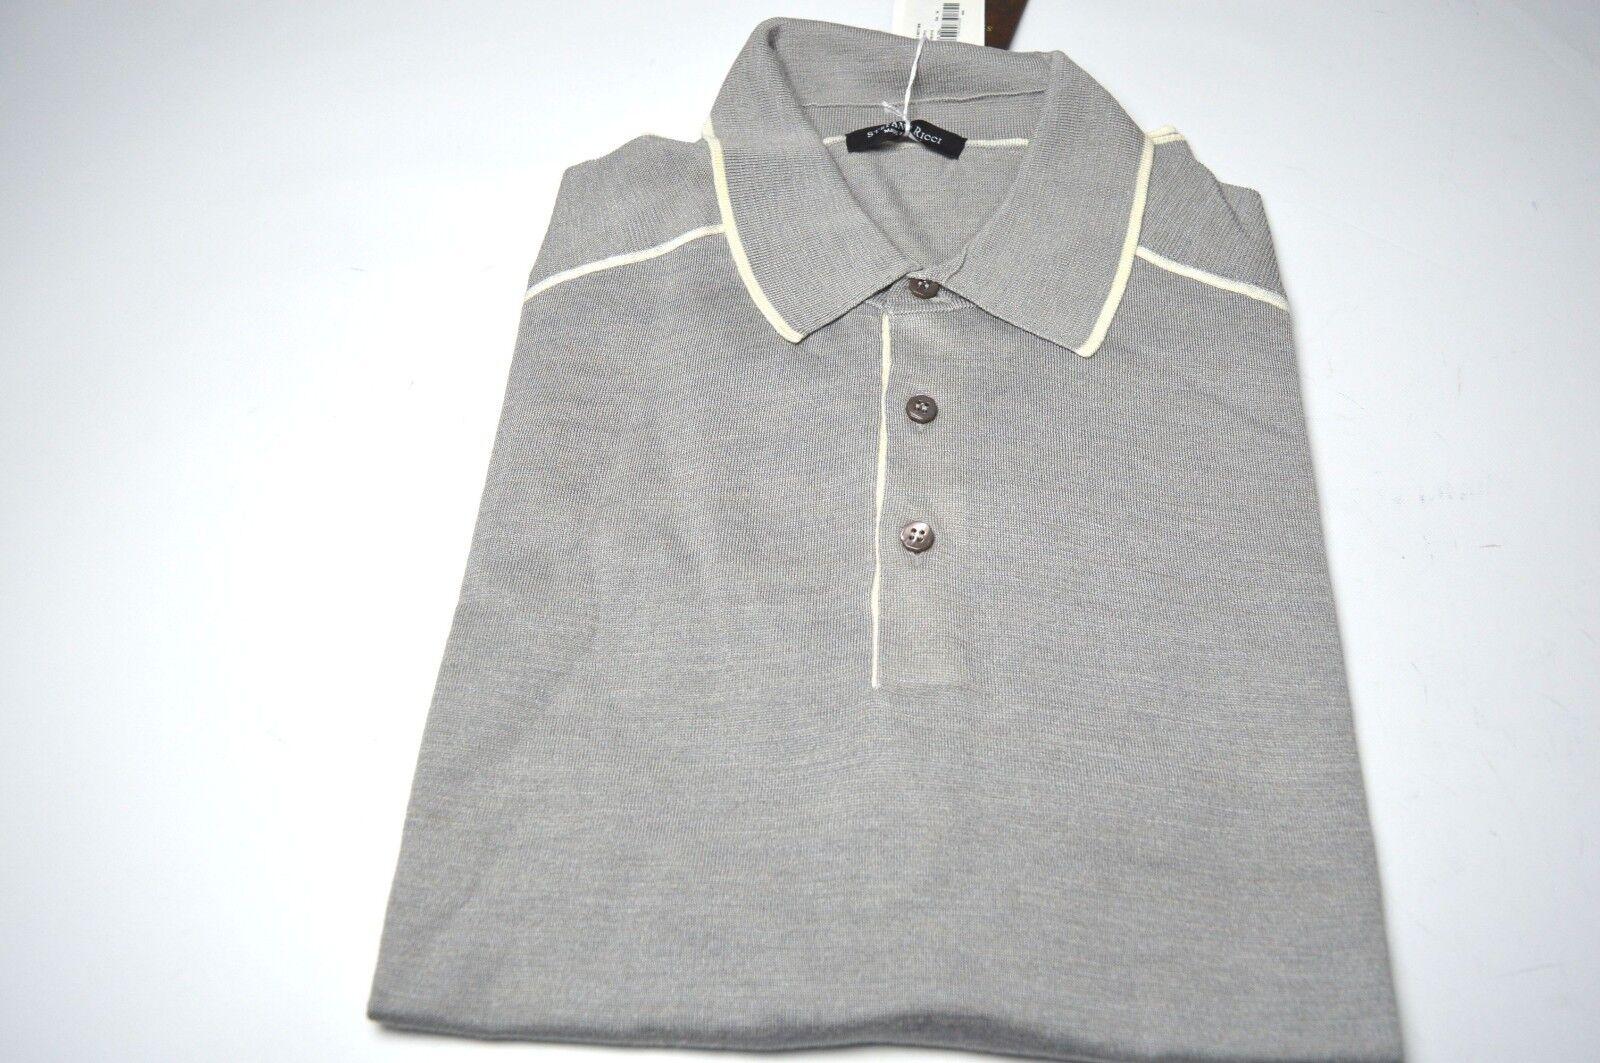 NEW   1740,00 STEFANO RICCI Sweater  Cashmere  Us Size XL Us  54 Eu (COD AE12) 11117e